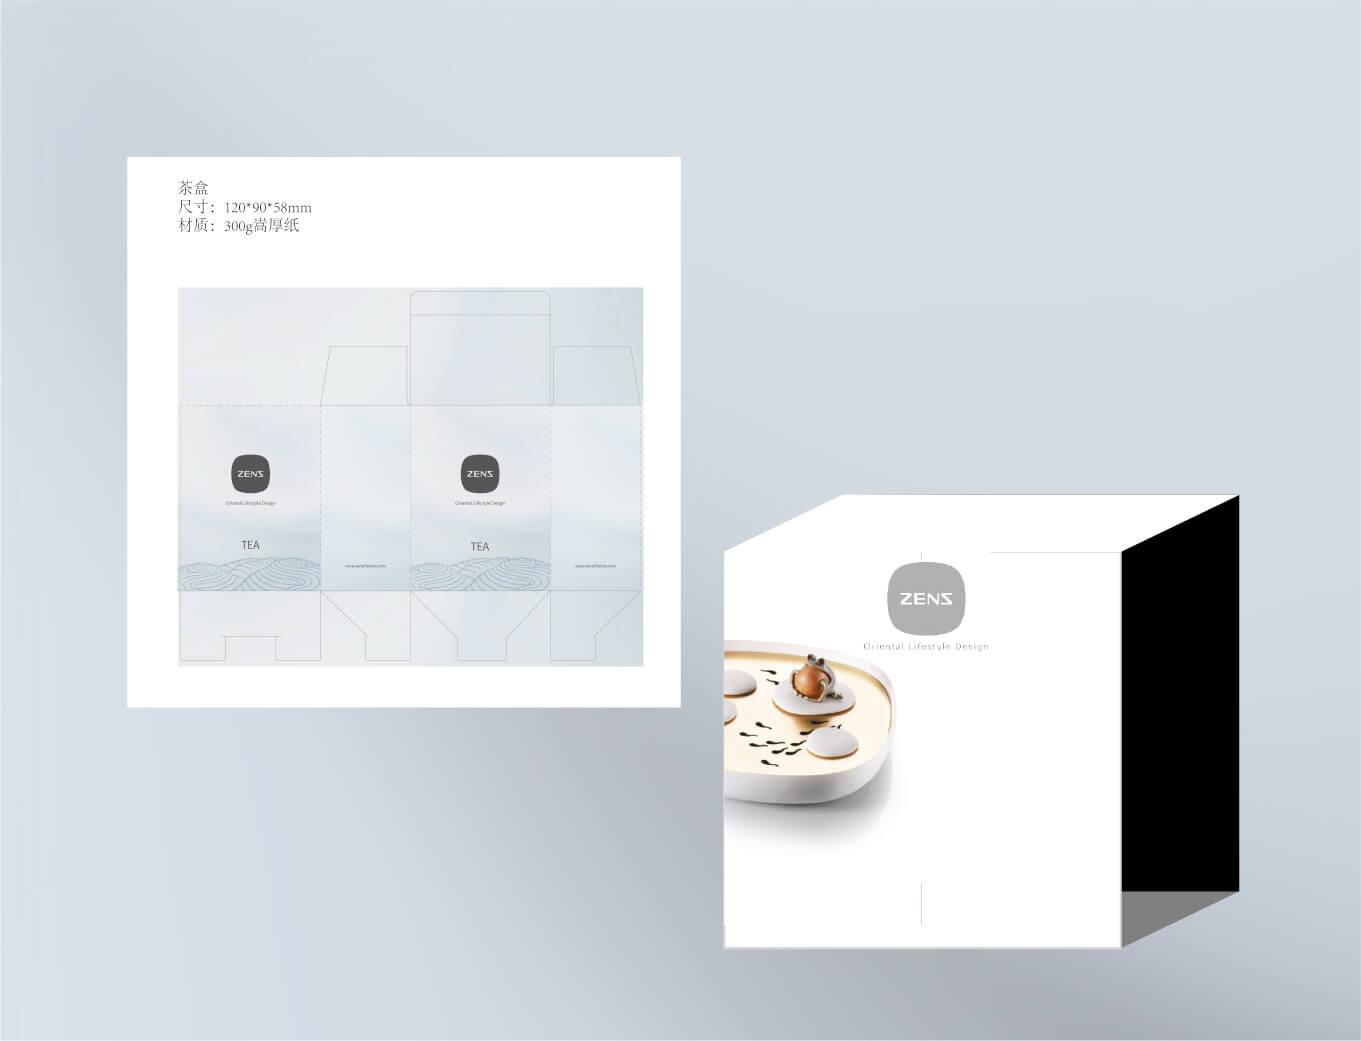 zens tableware brand product packaging box